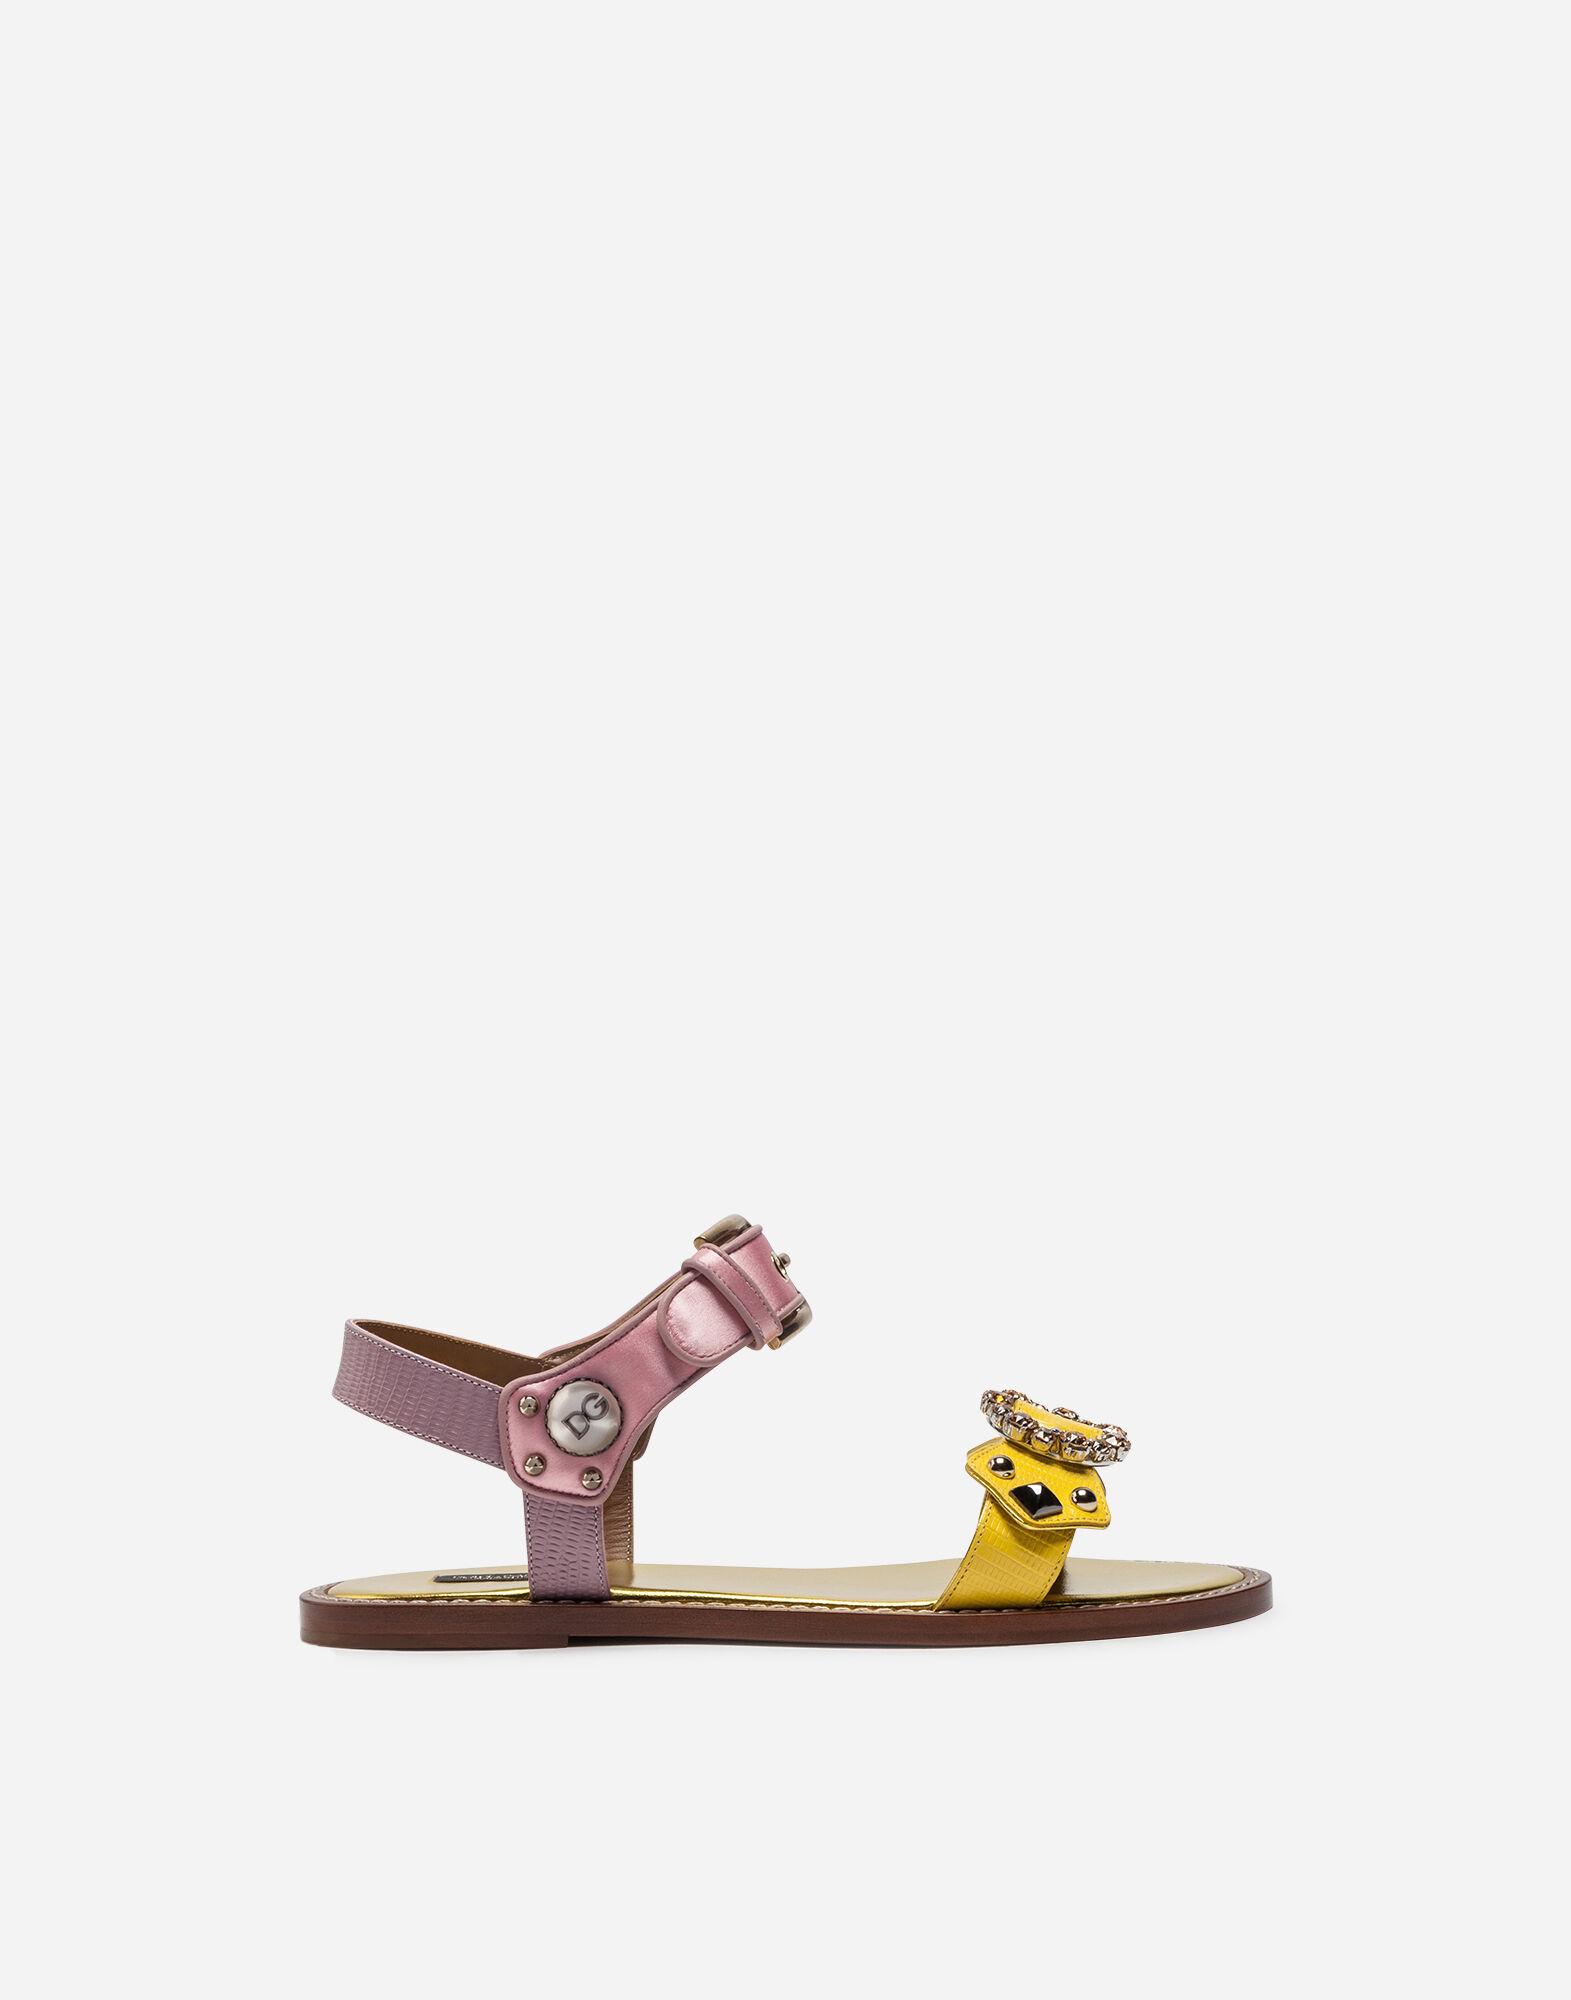 Dolce & Gabbana  SANDAL IN IGUANA PRINT CALFSKIN AND SATIN WITH APPLIQUÉS